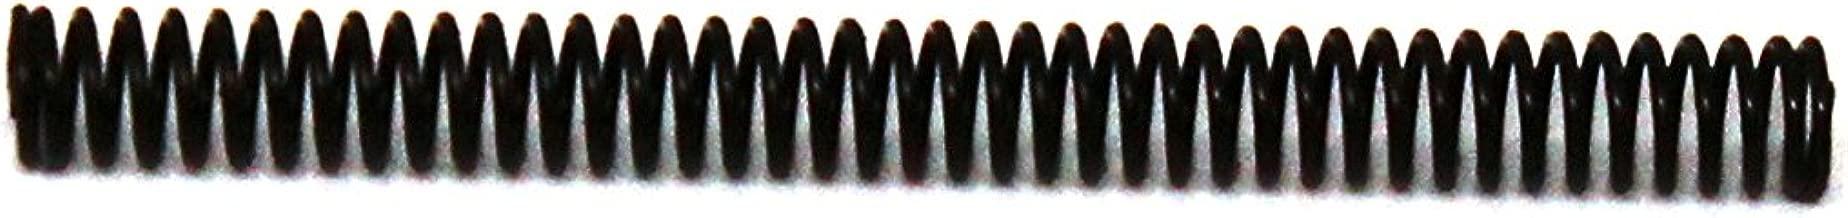 Senco KB4190 Sfn40 Spring Compression